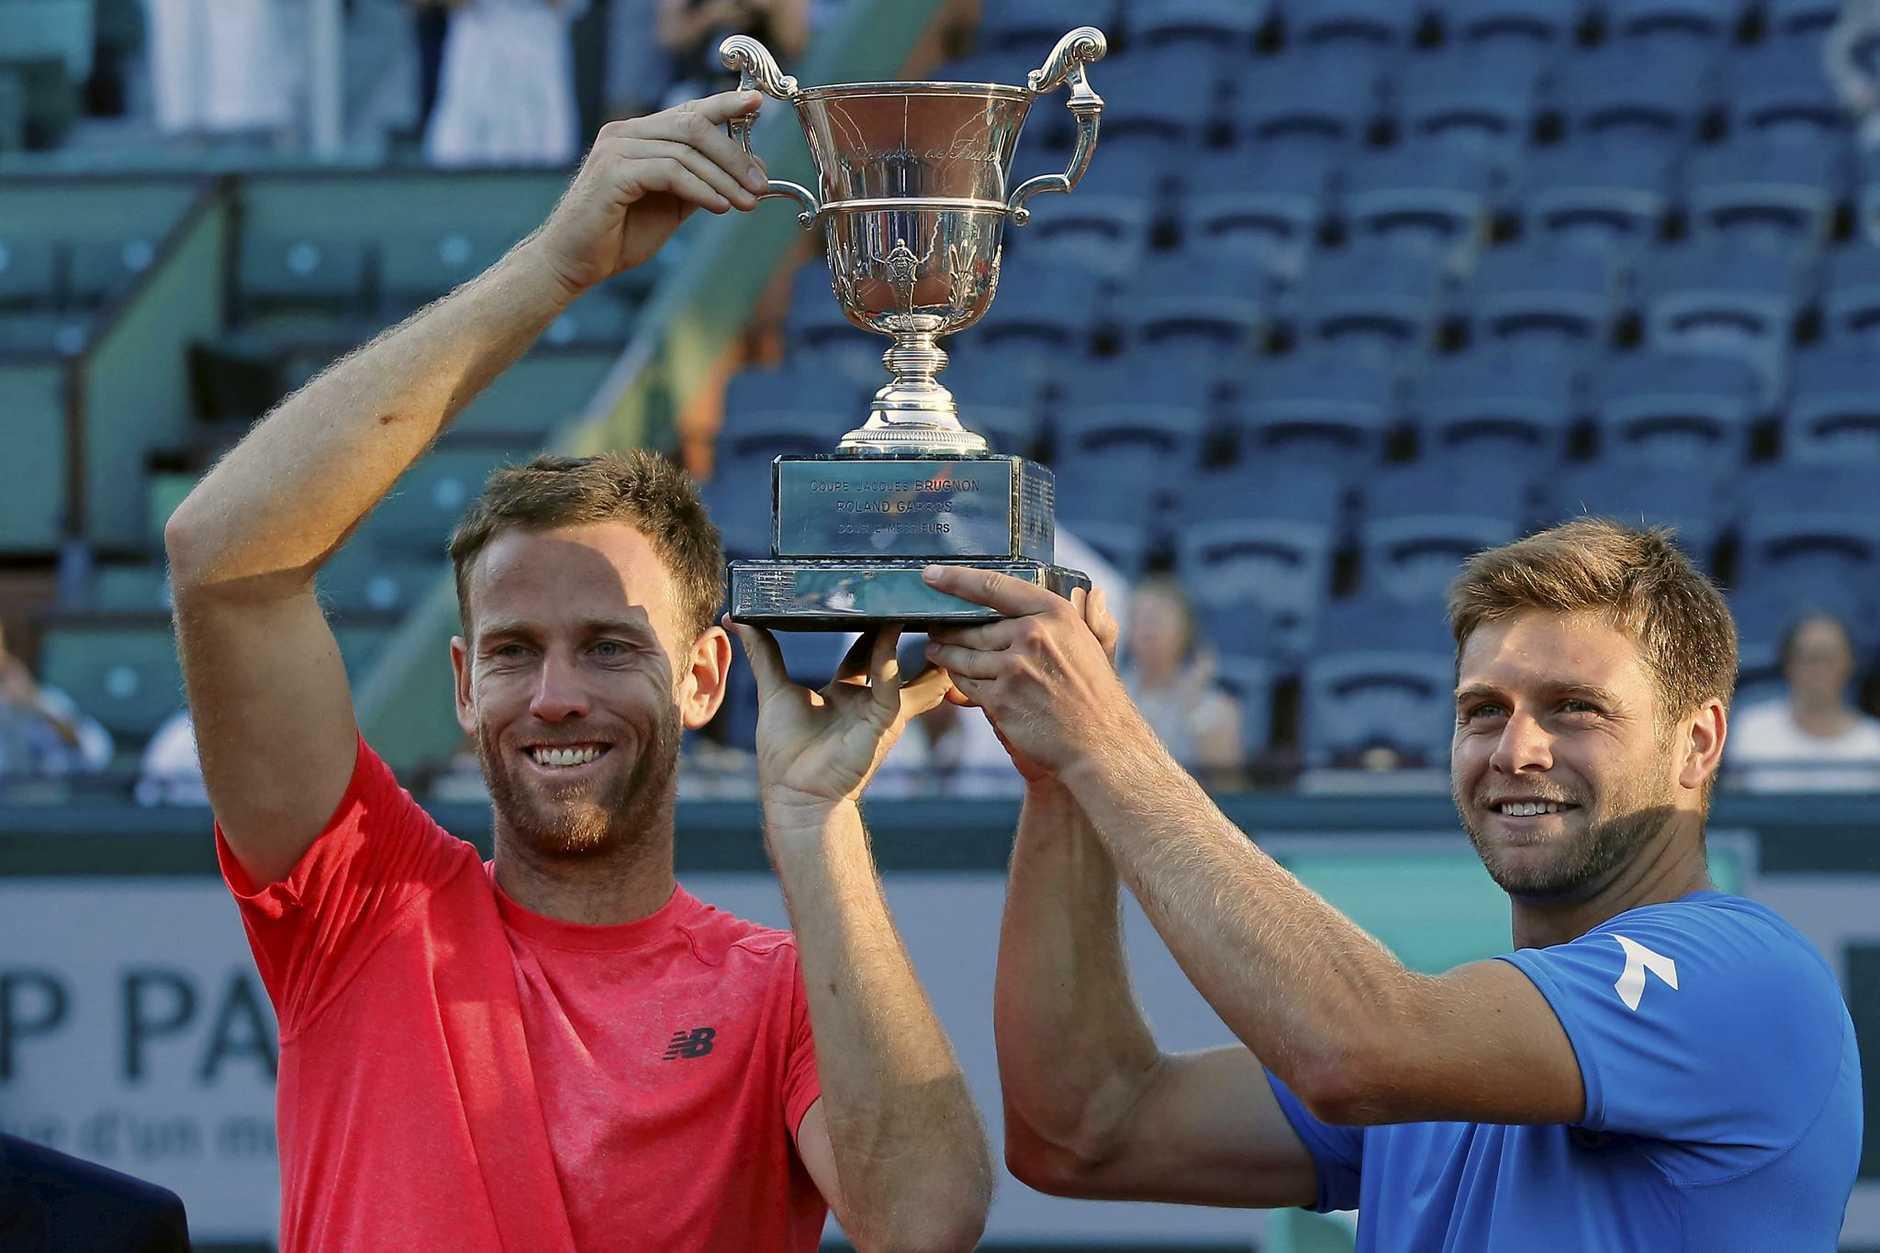 CHAMPIONS: American Ryan Harrison and Kiwi Michael Venus celebrate winning the French Open men's doubles title.